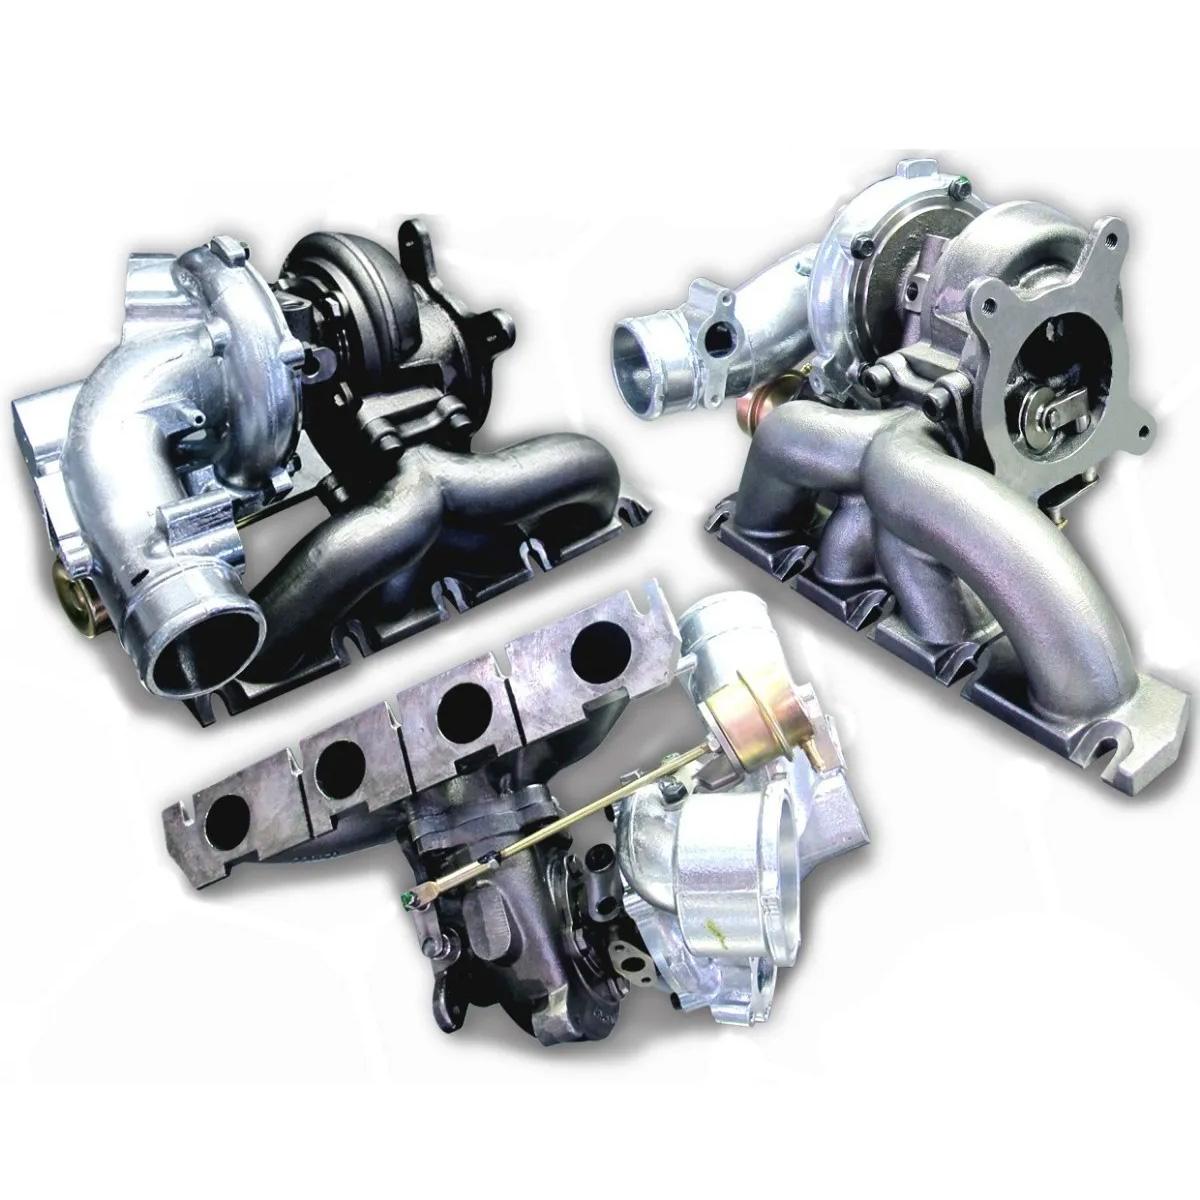 Turbina Upgrade 200cv 300cv Vw Jetta Fusca Audi Tsi AUT888 Turbo